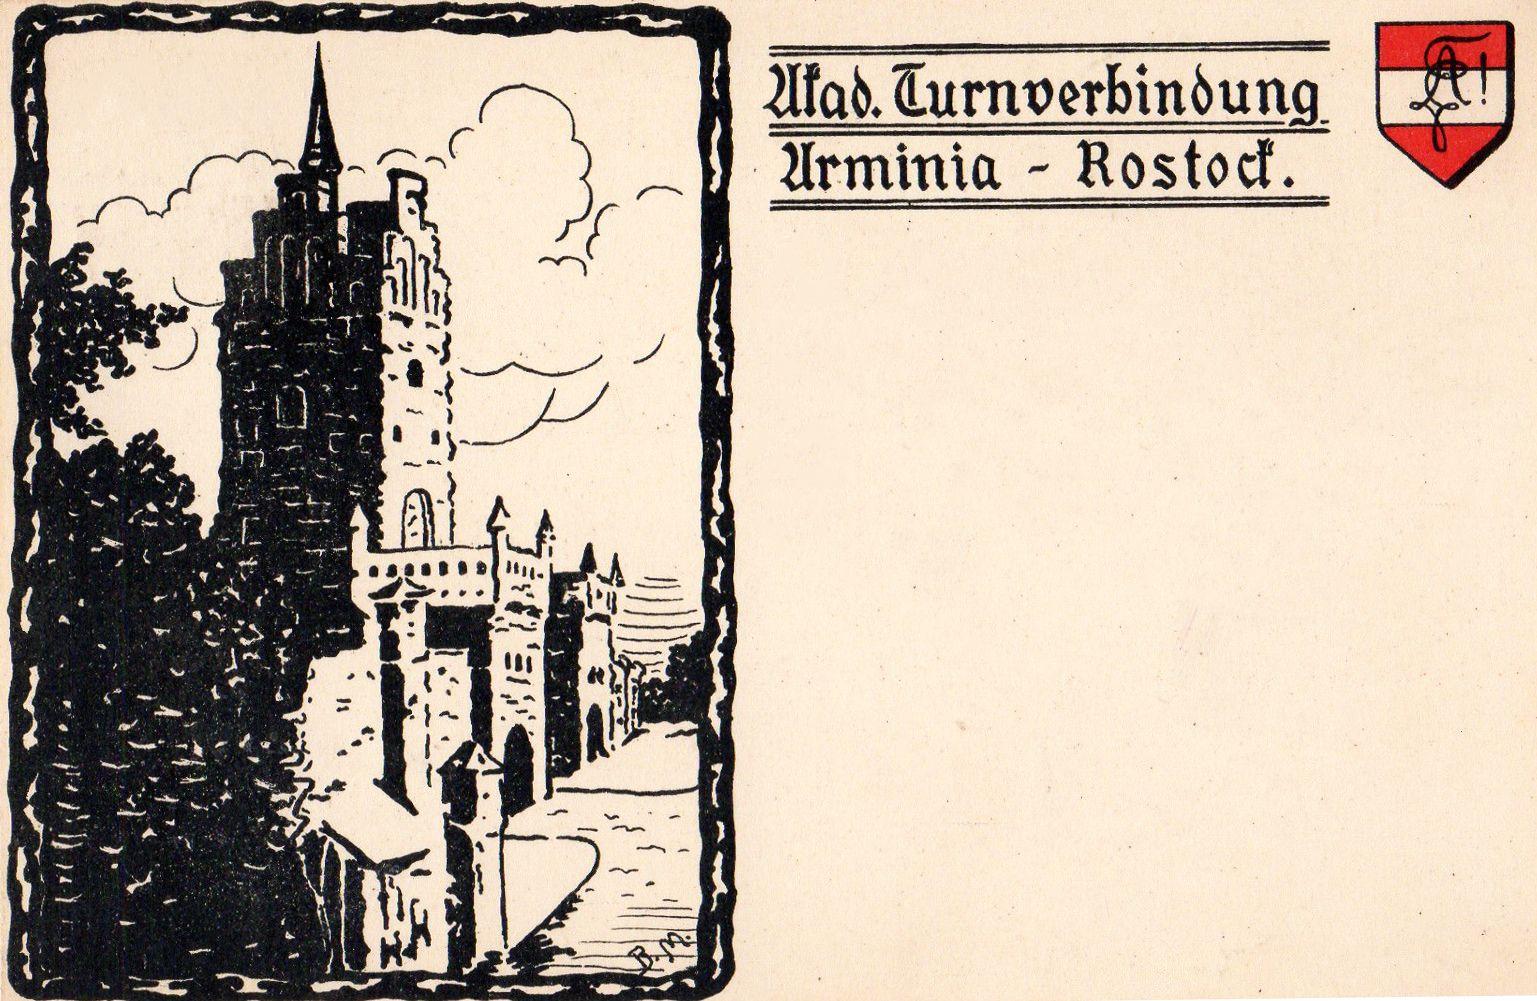 Studentenverbindung Rostock